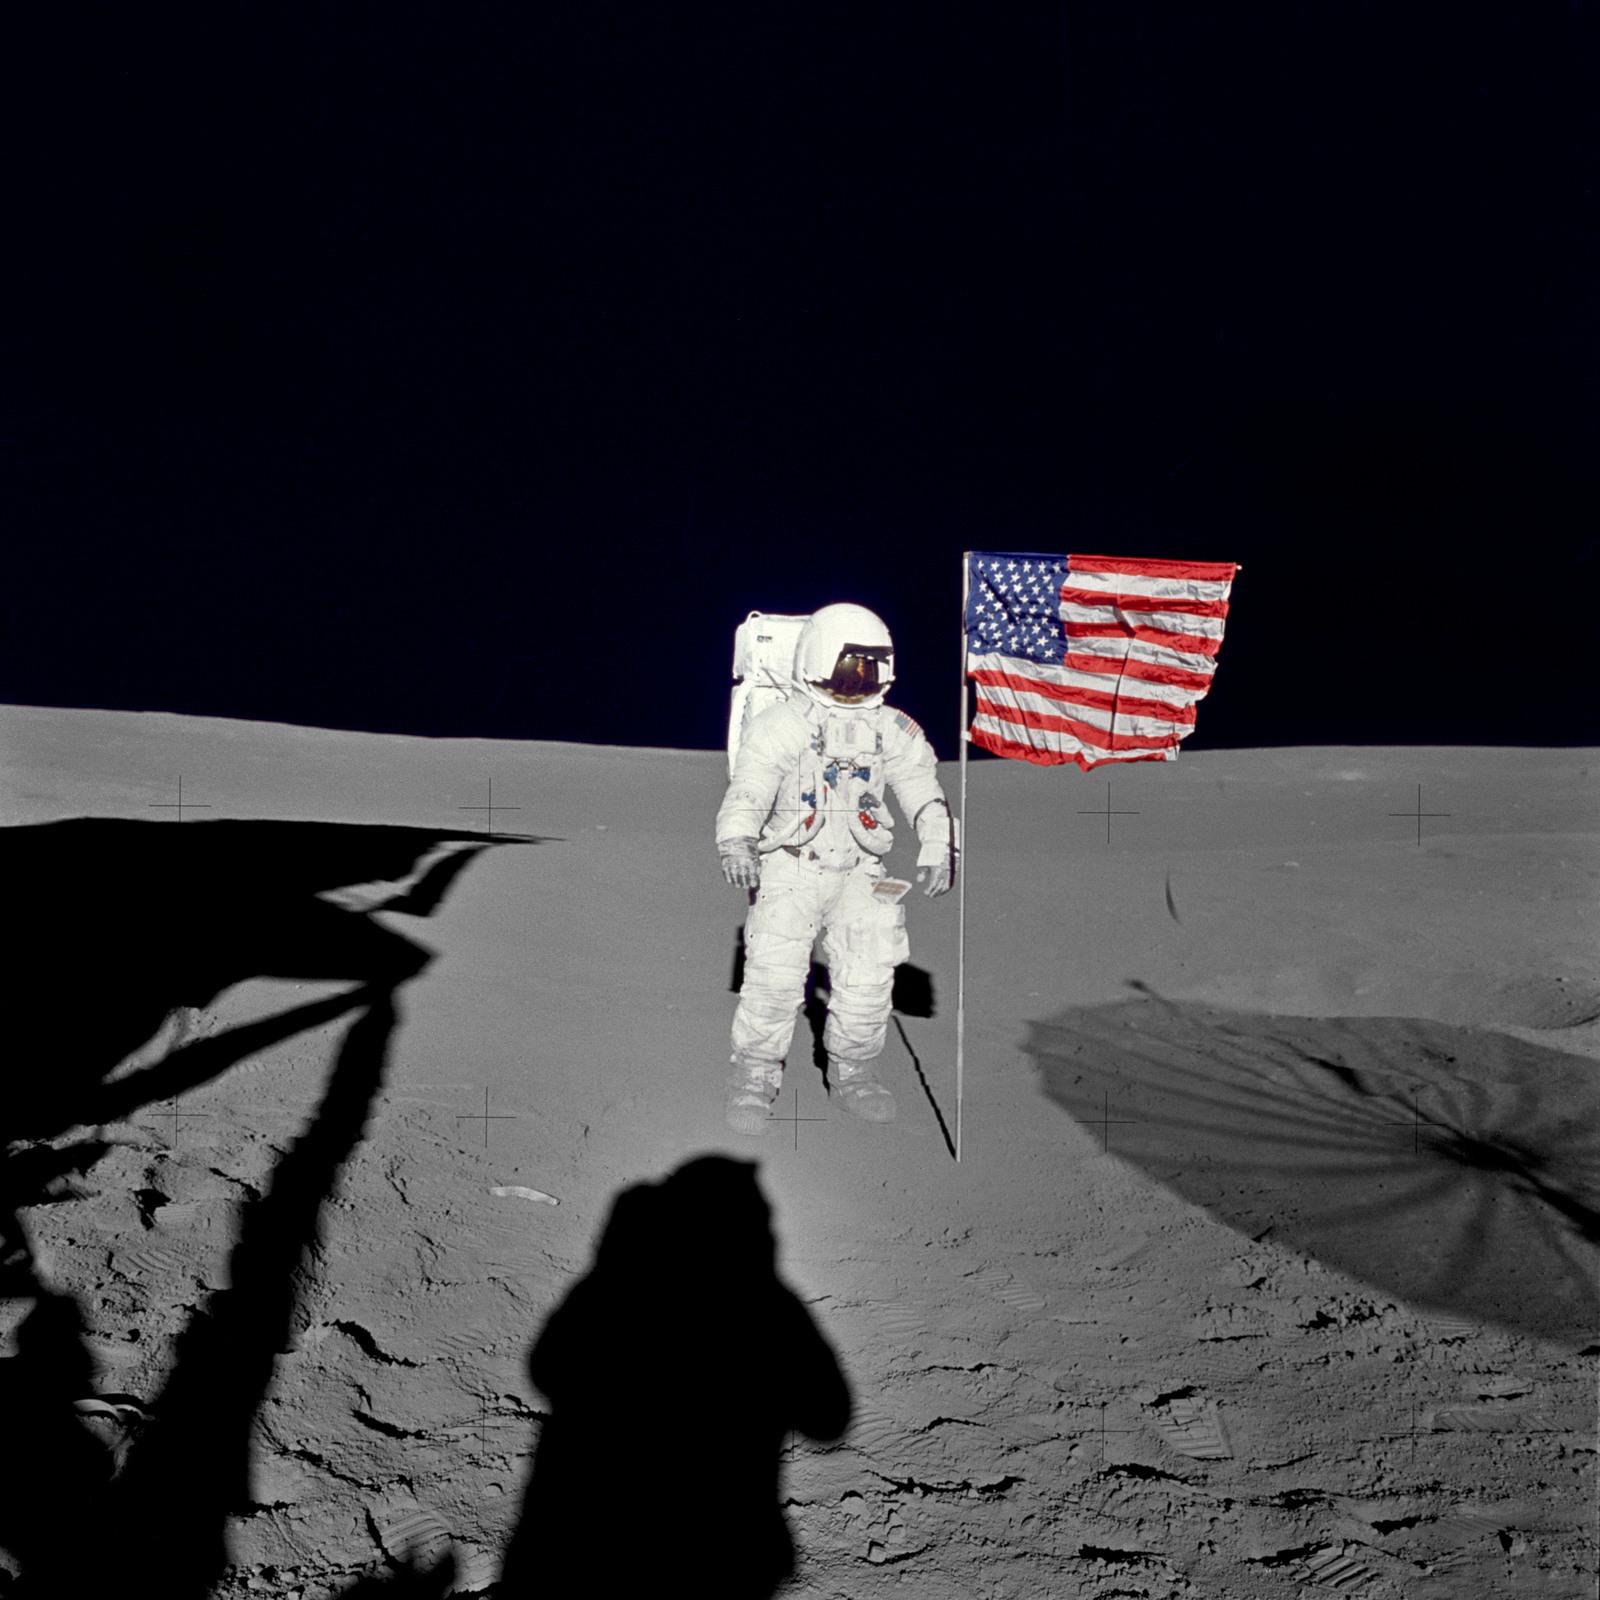 AS14-66-9233 - Apollo 14 - Apollo 14 Mission image - Astronaut Edgar D. Mitchell, lunar module pilot